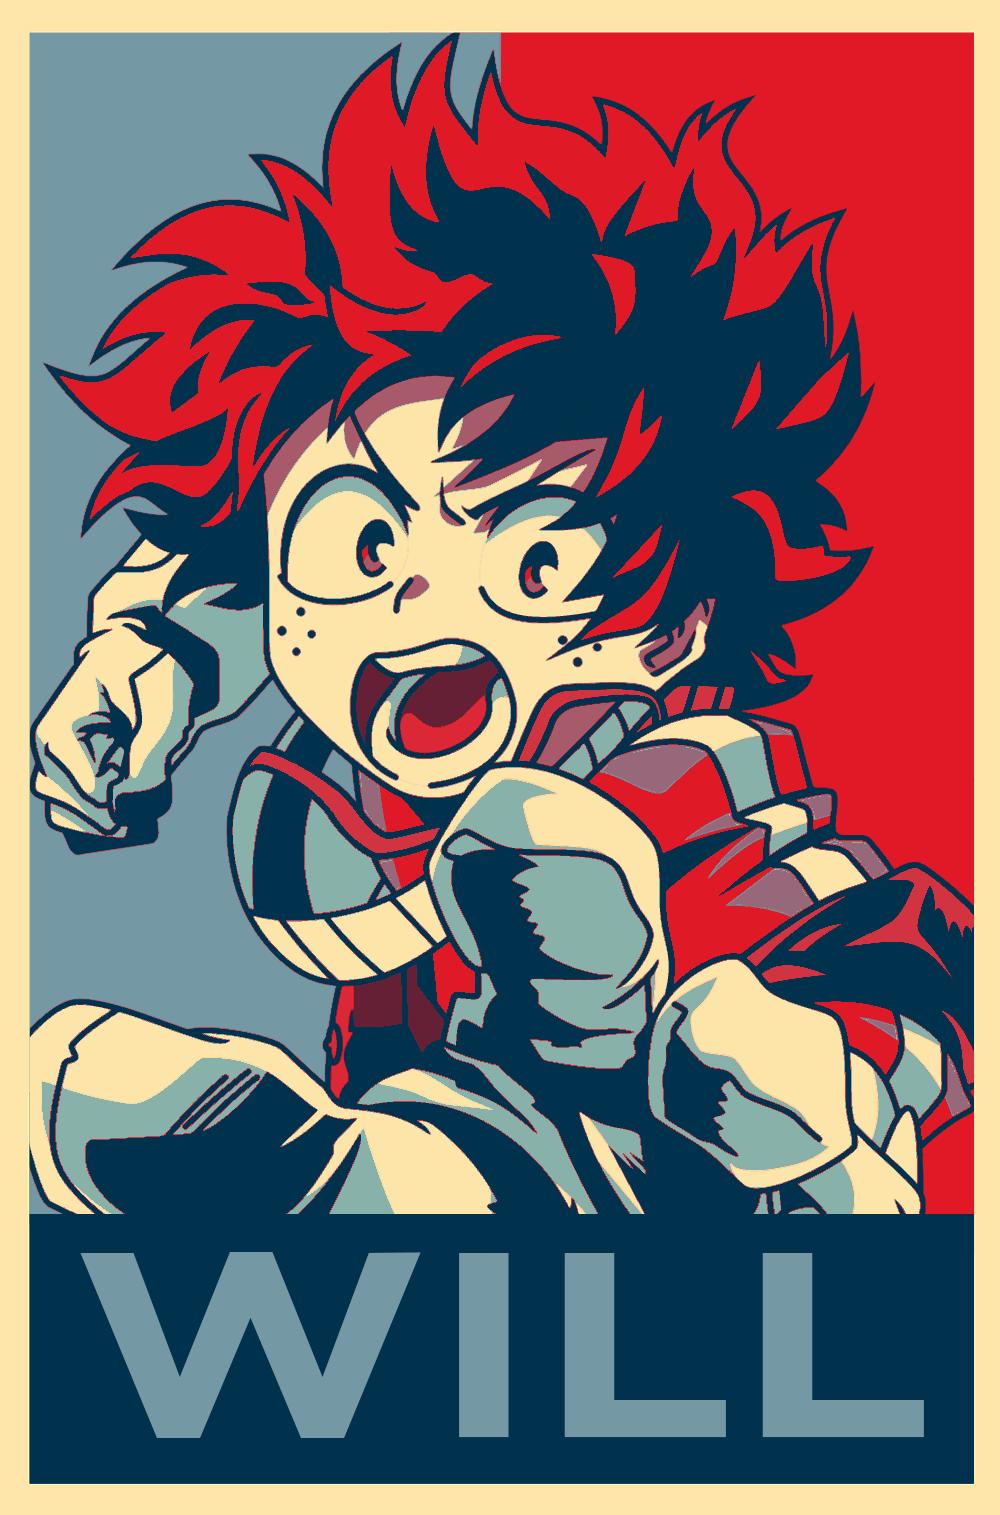 anime wallpaper, assorted Anime characters poster Son Goku